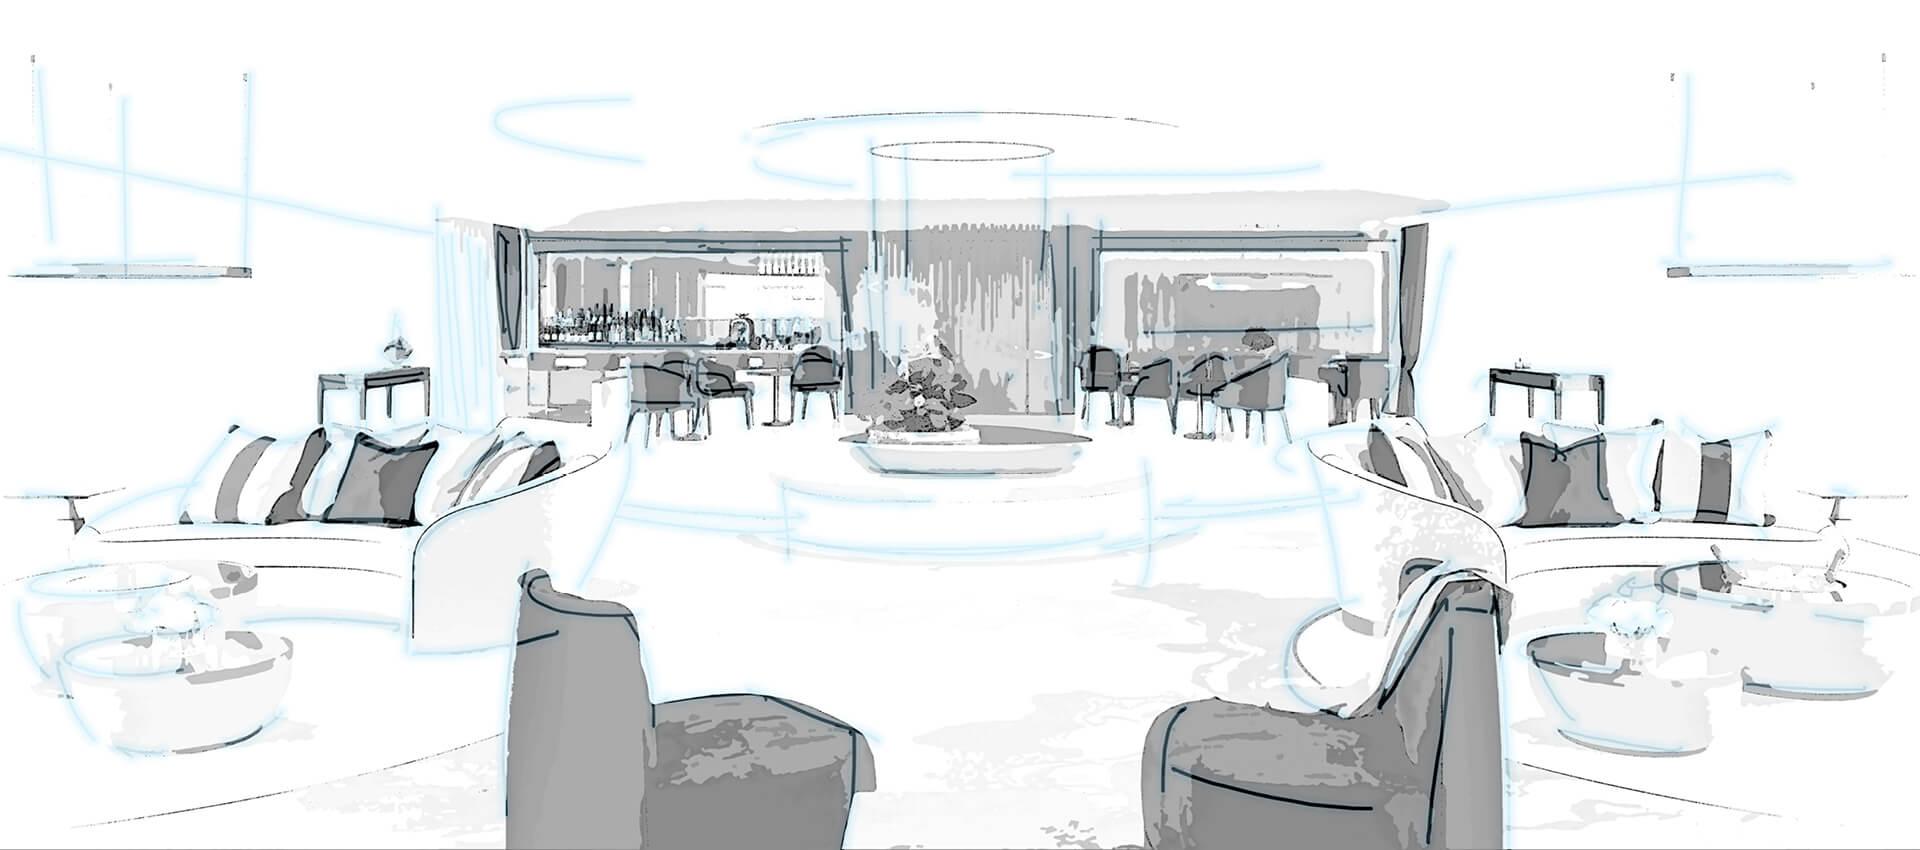 Sanders Studios_Serene Superyacht Visualisation_Interior Saloon Sketch